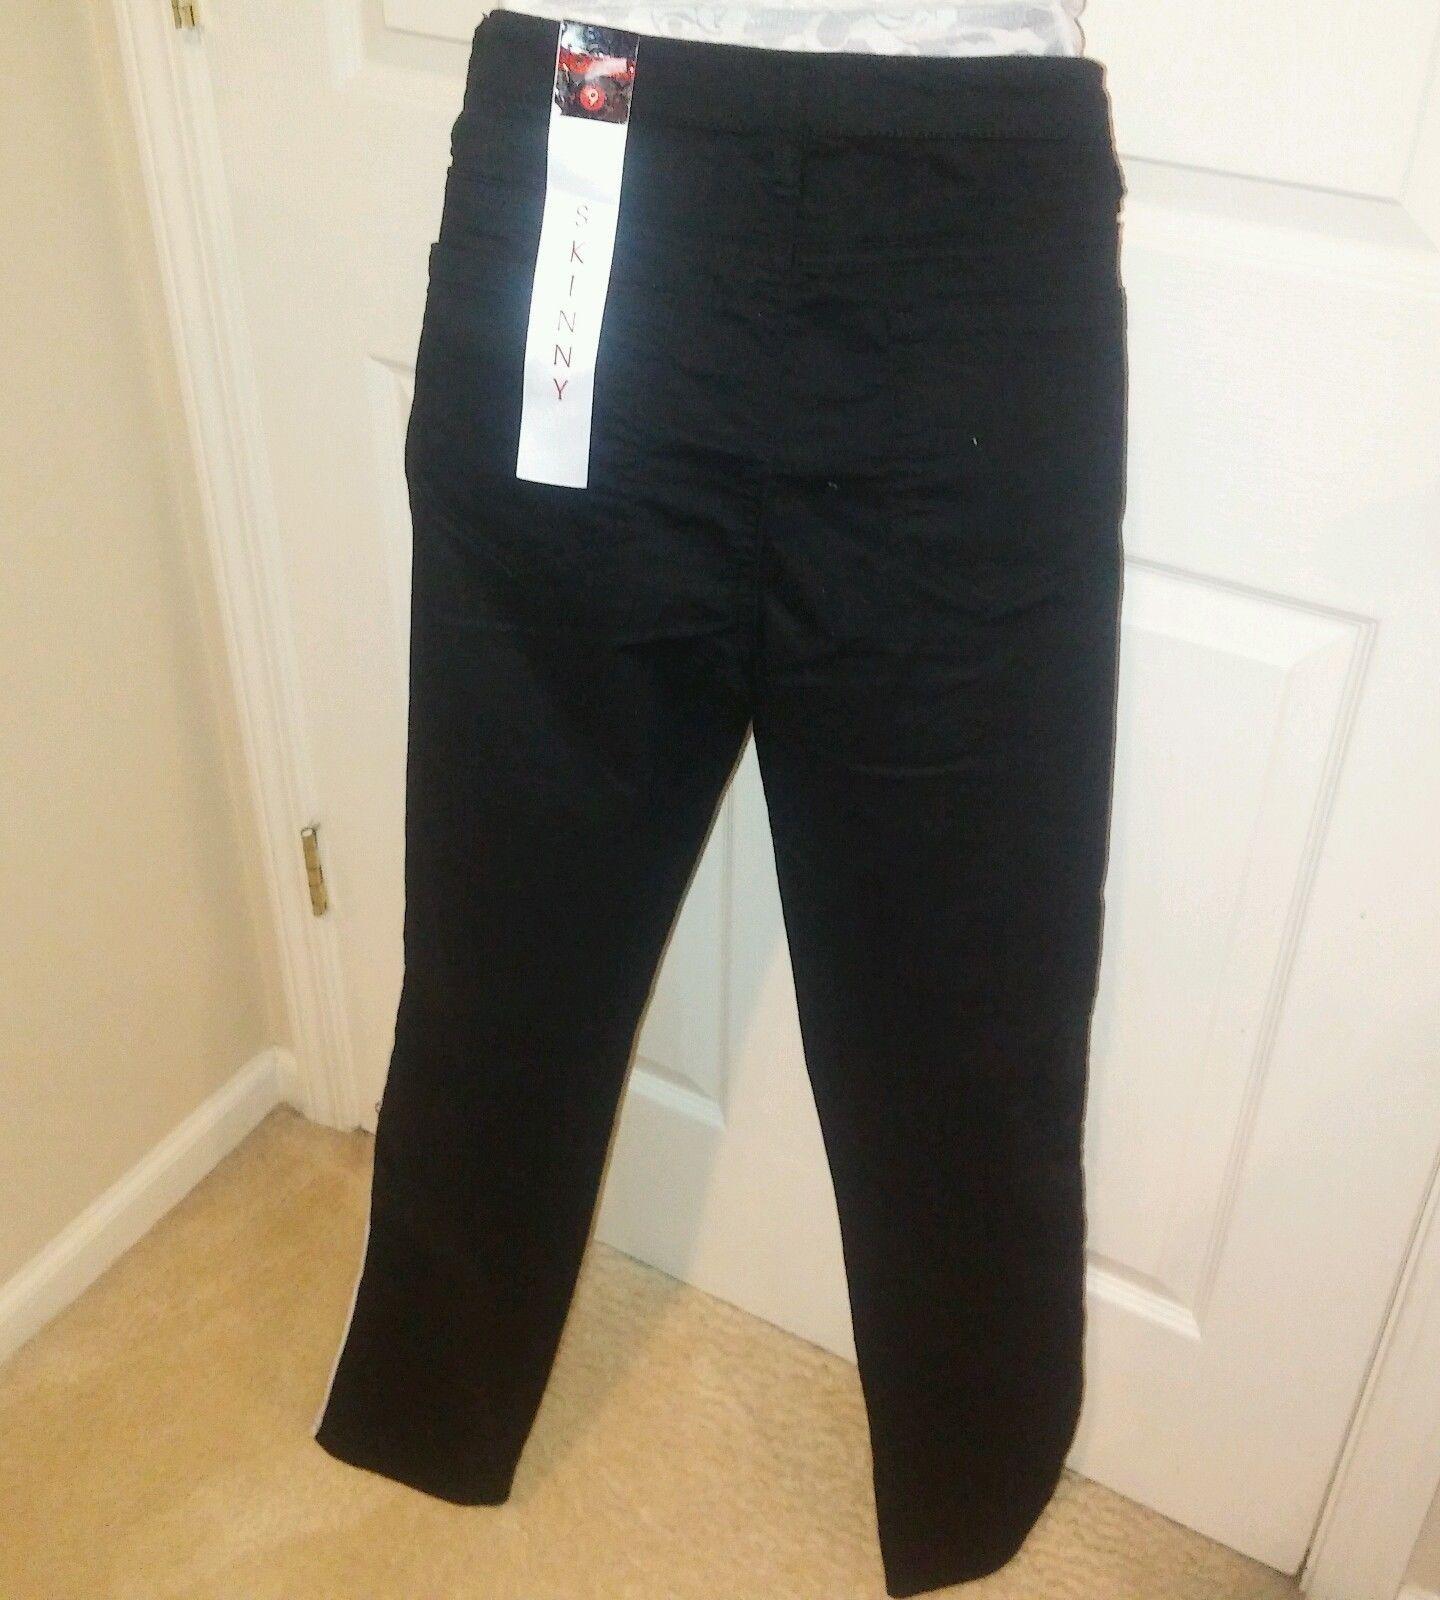 Bongo Juniors Black/White Stretch Jeans Size 9